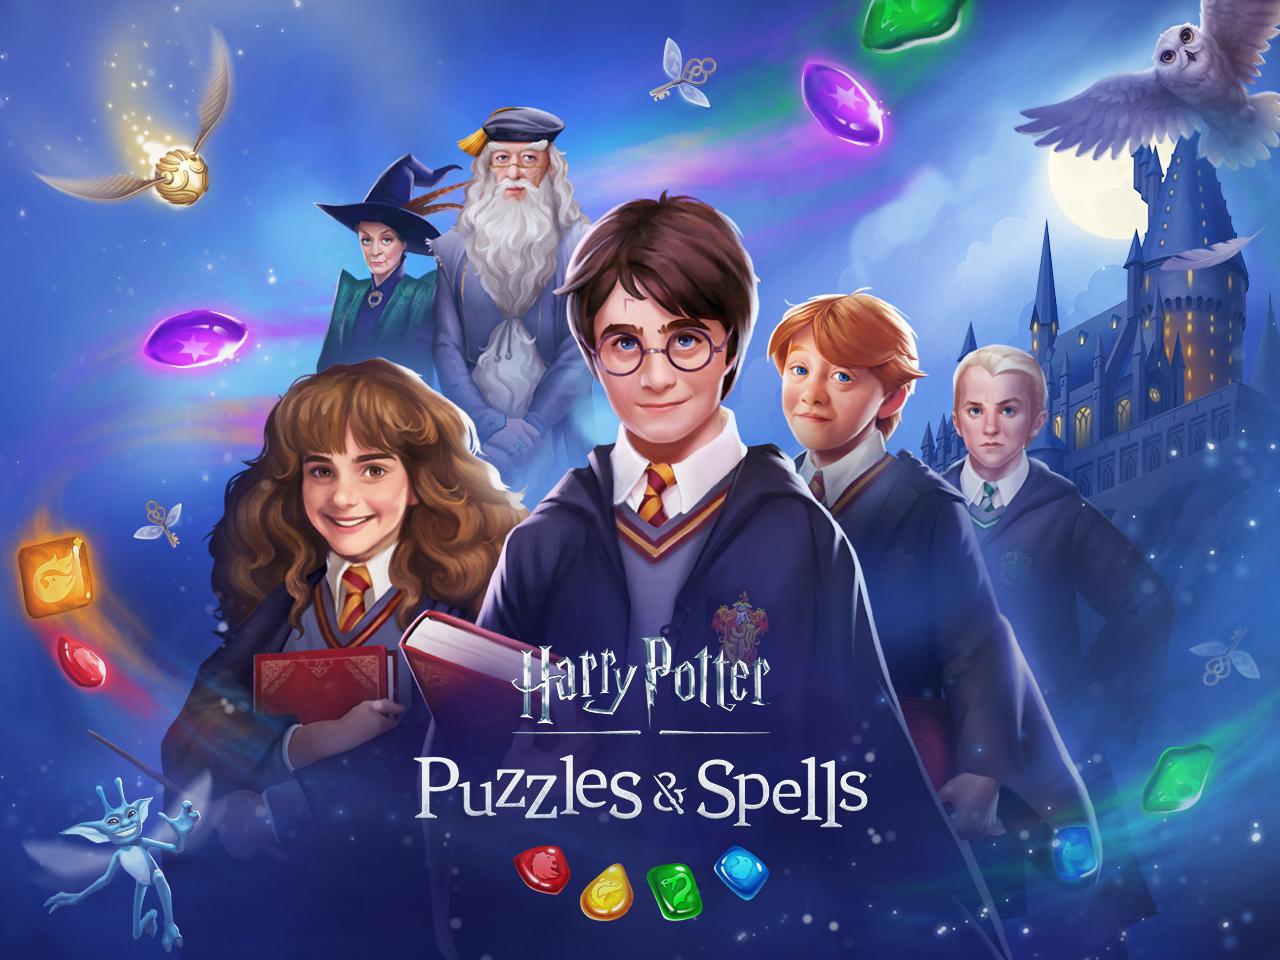 Arte do jogo Harry Potter: Puzzles & Spells, mostrando Minerva, Dumbledore, Hermione, Harry, Rony e Draco.